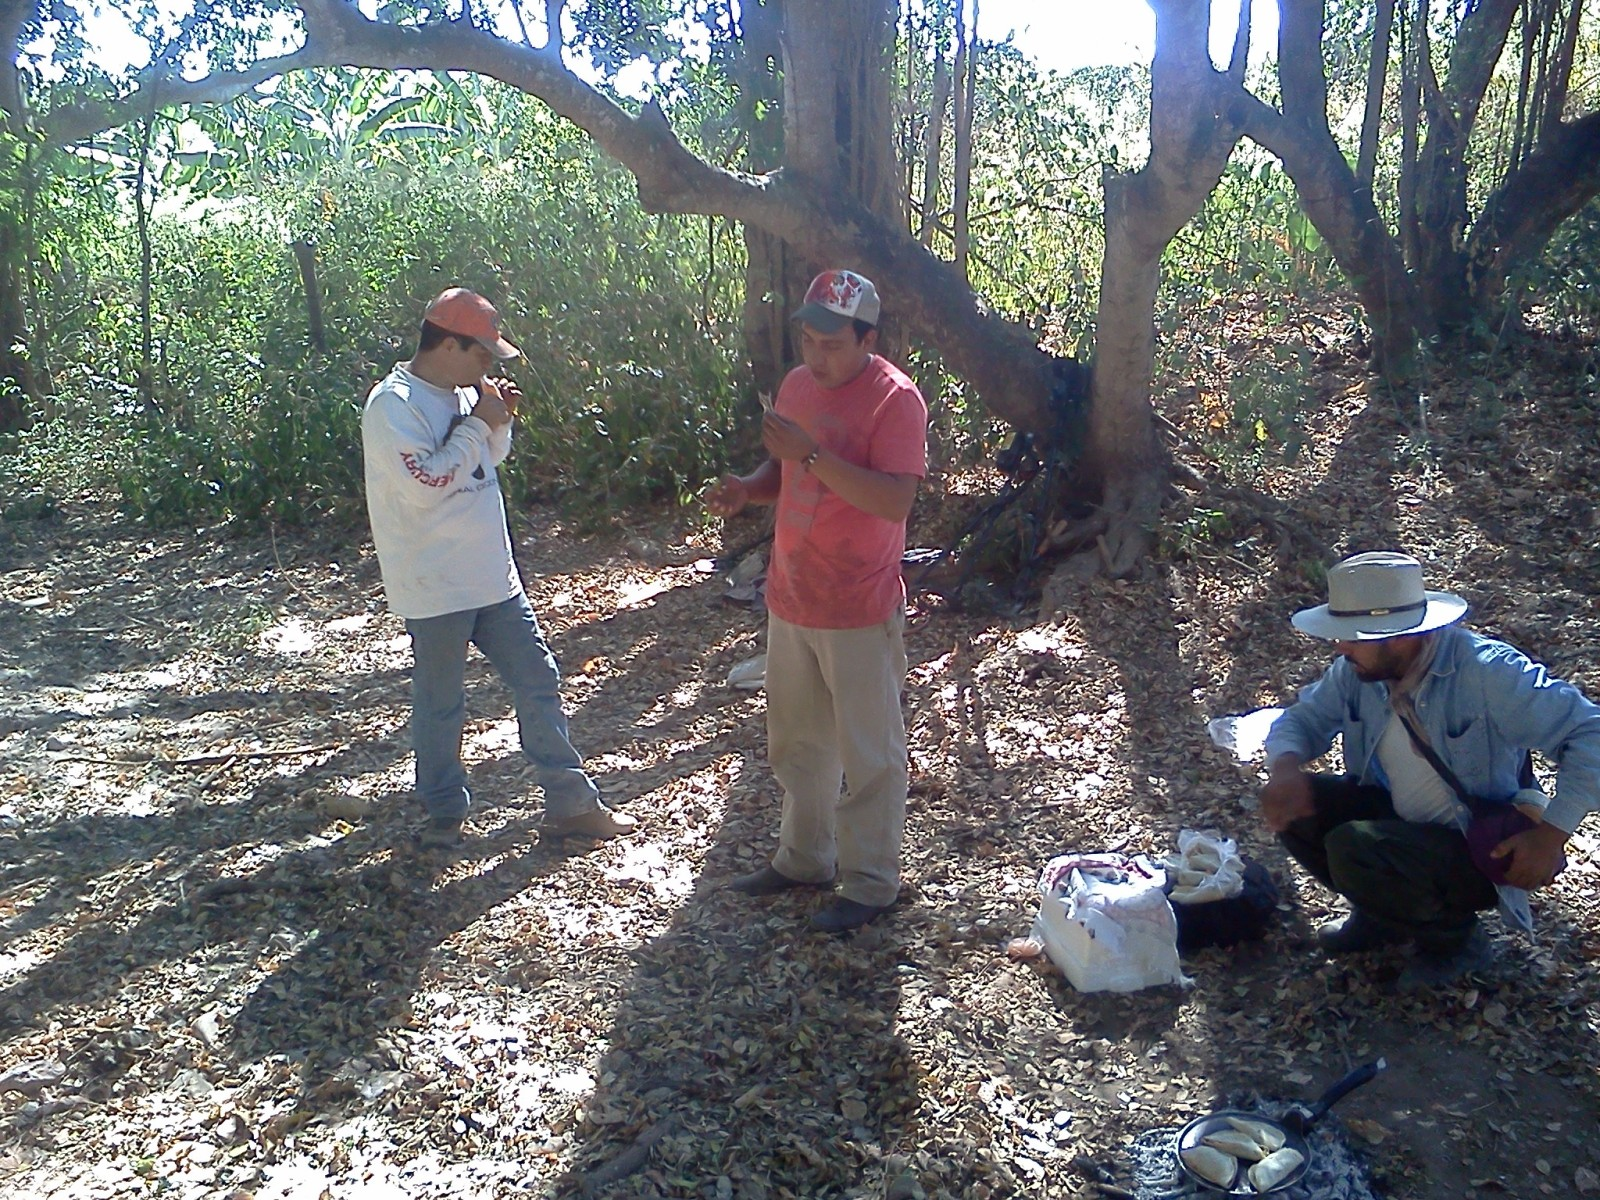 Macucas Hallazgo de el Grupo de Tepic Nayarit F592fp